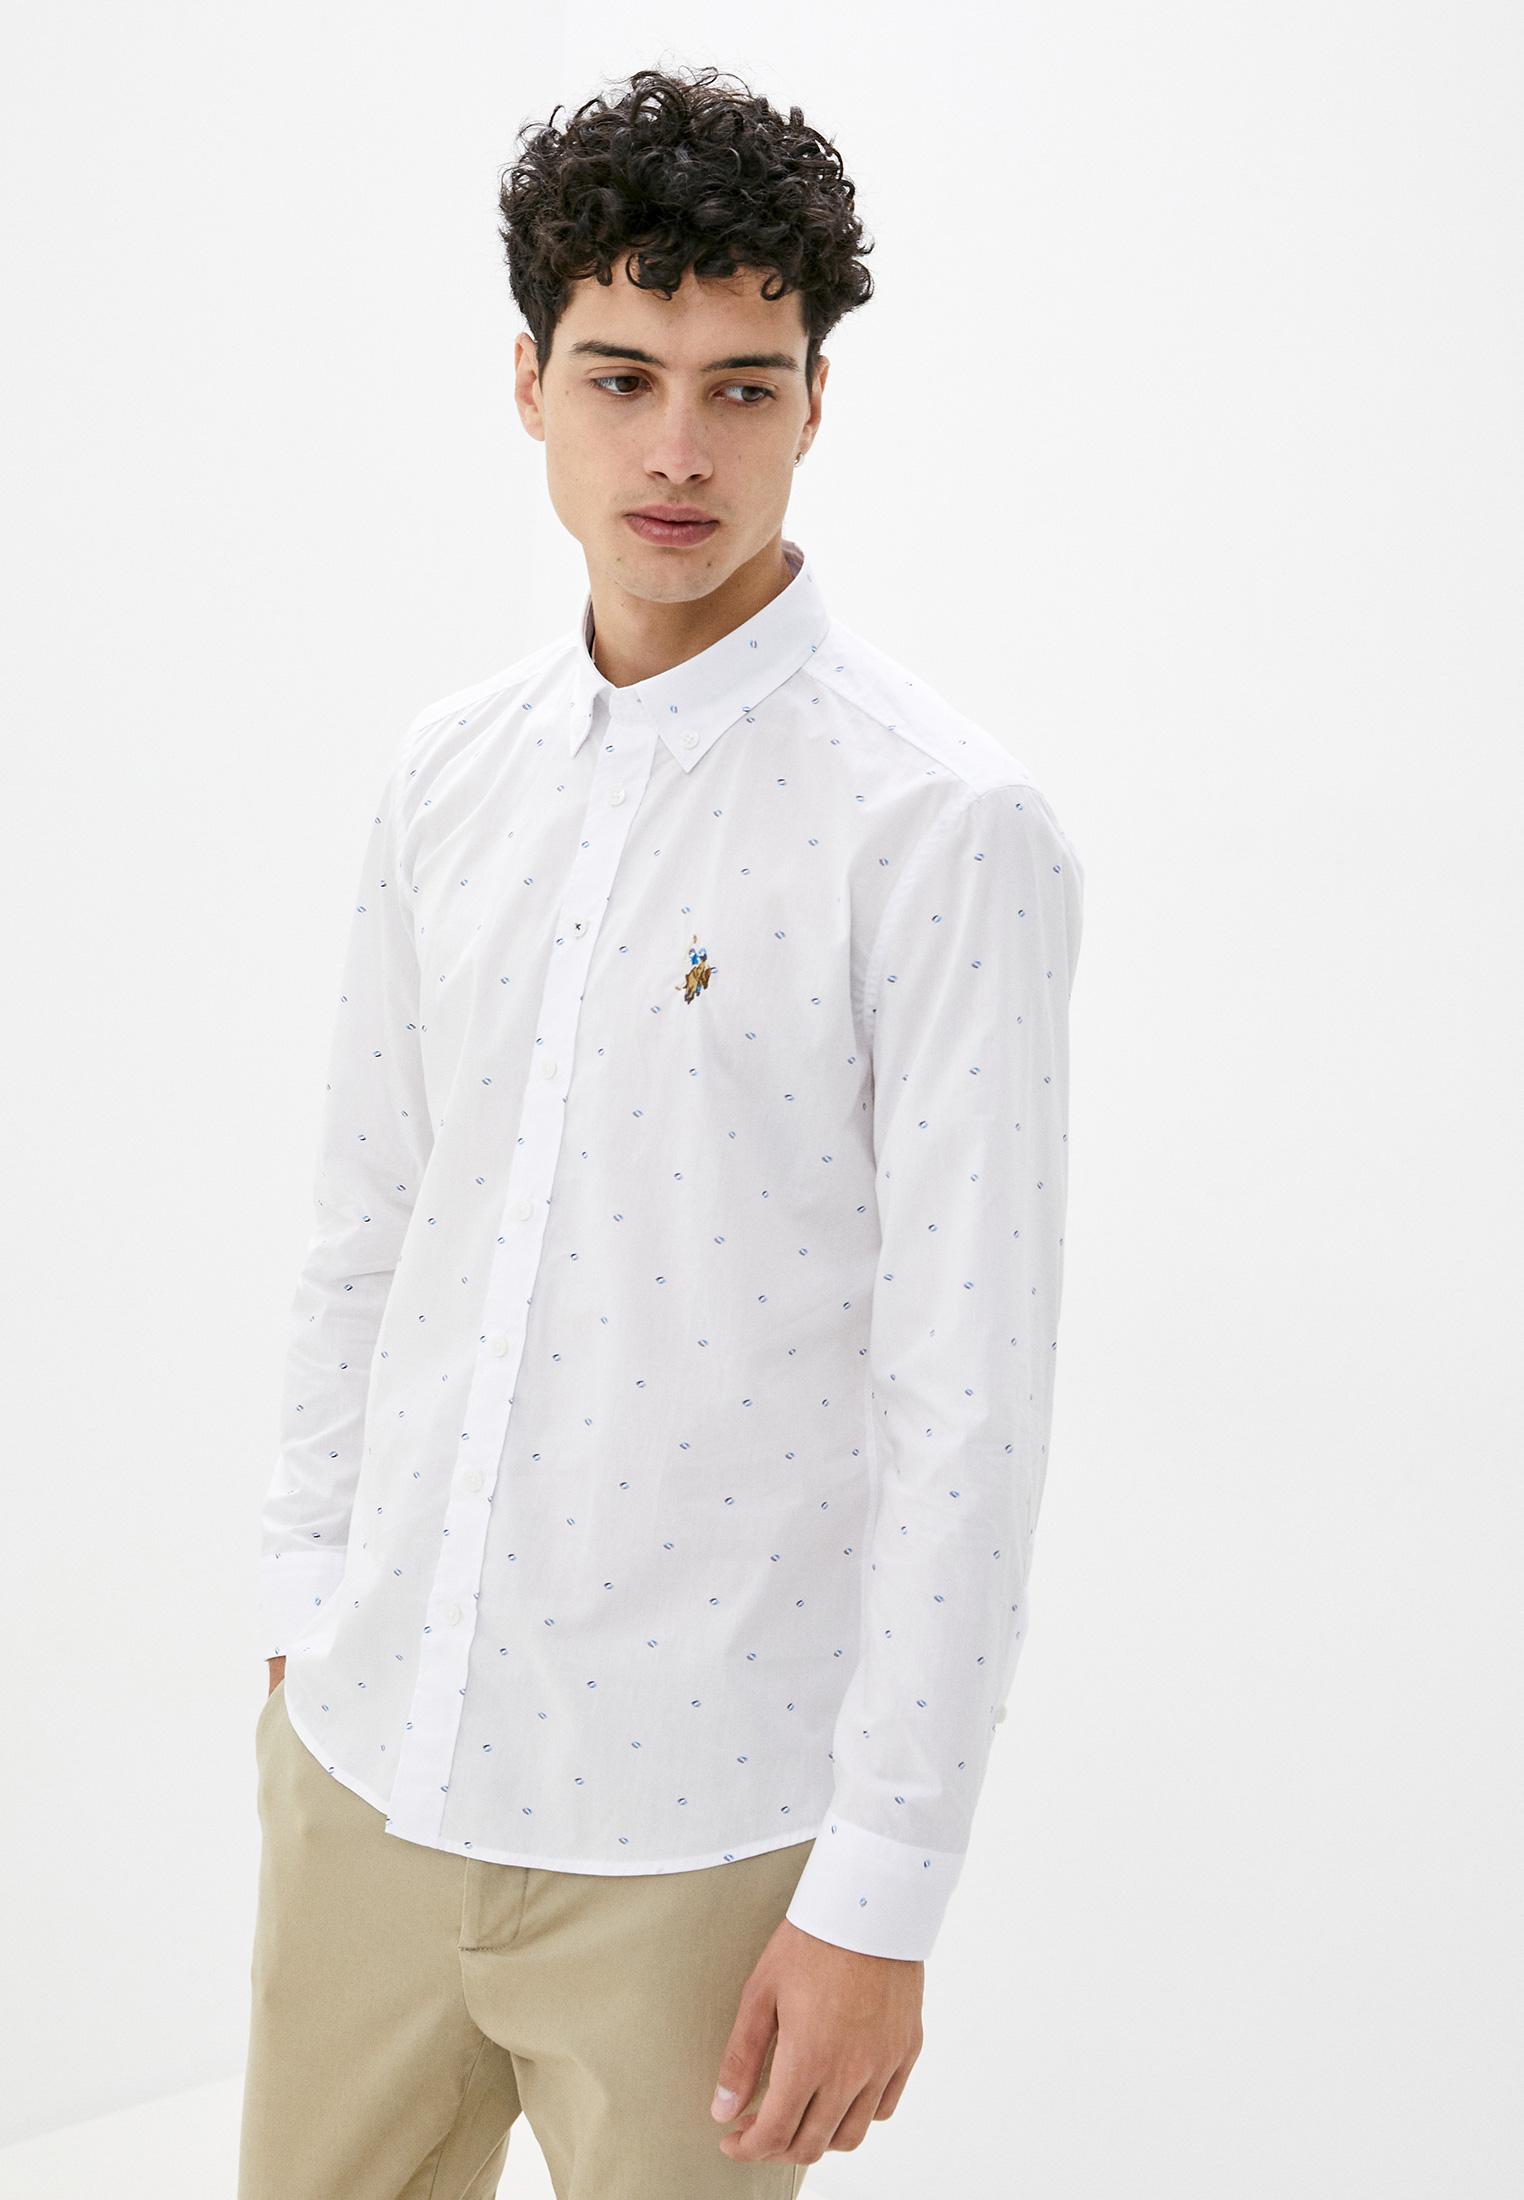 Рубашка U.S. Polo Assn. за 2 749 ₽. в интернет-магазине Lamoda.ru